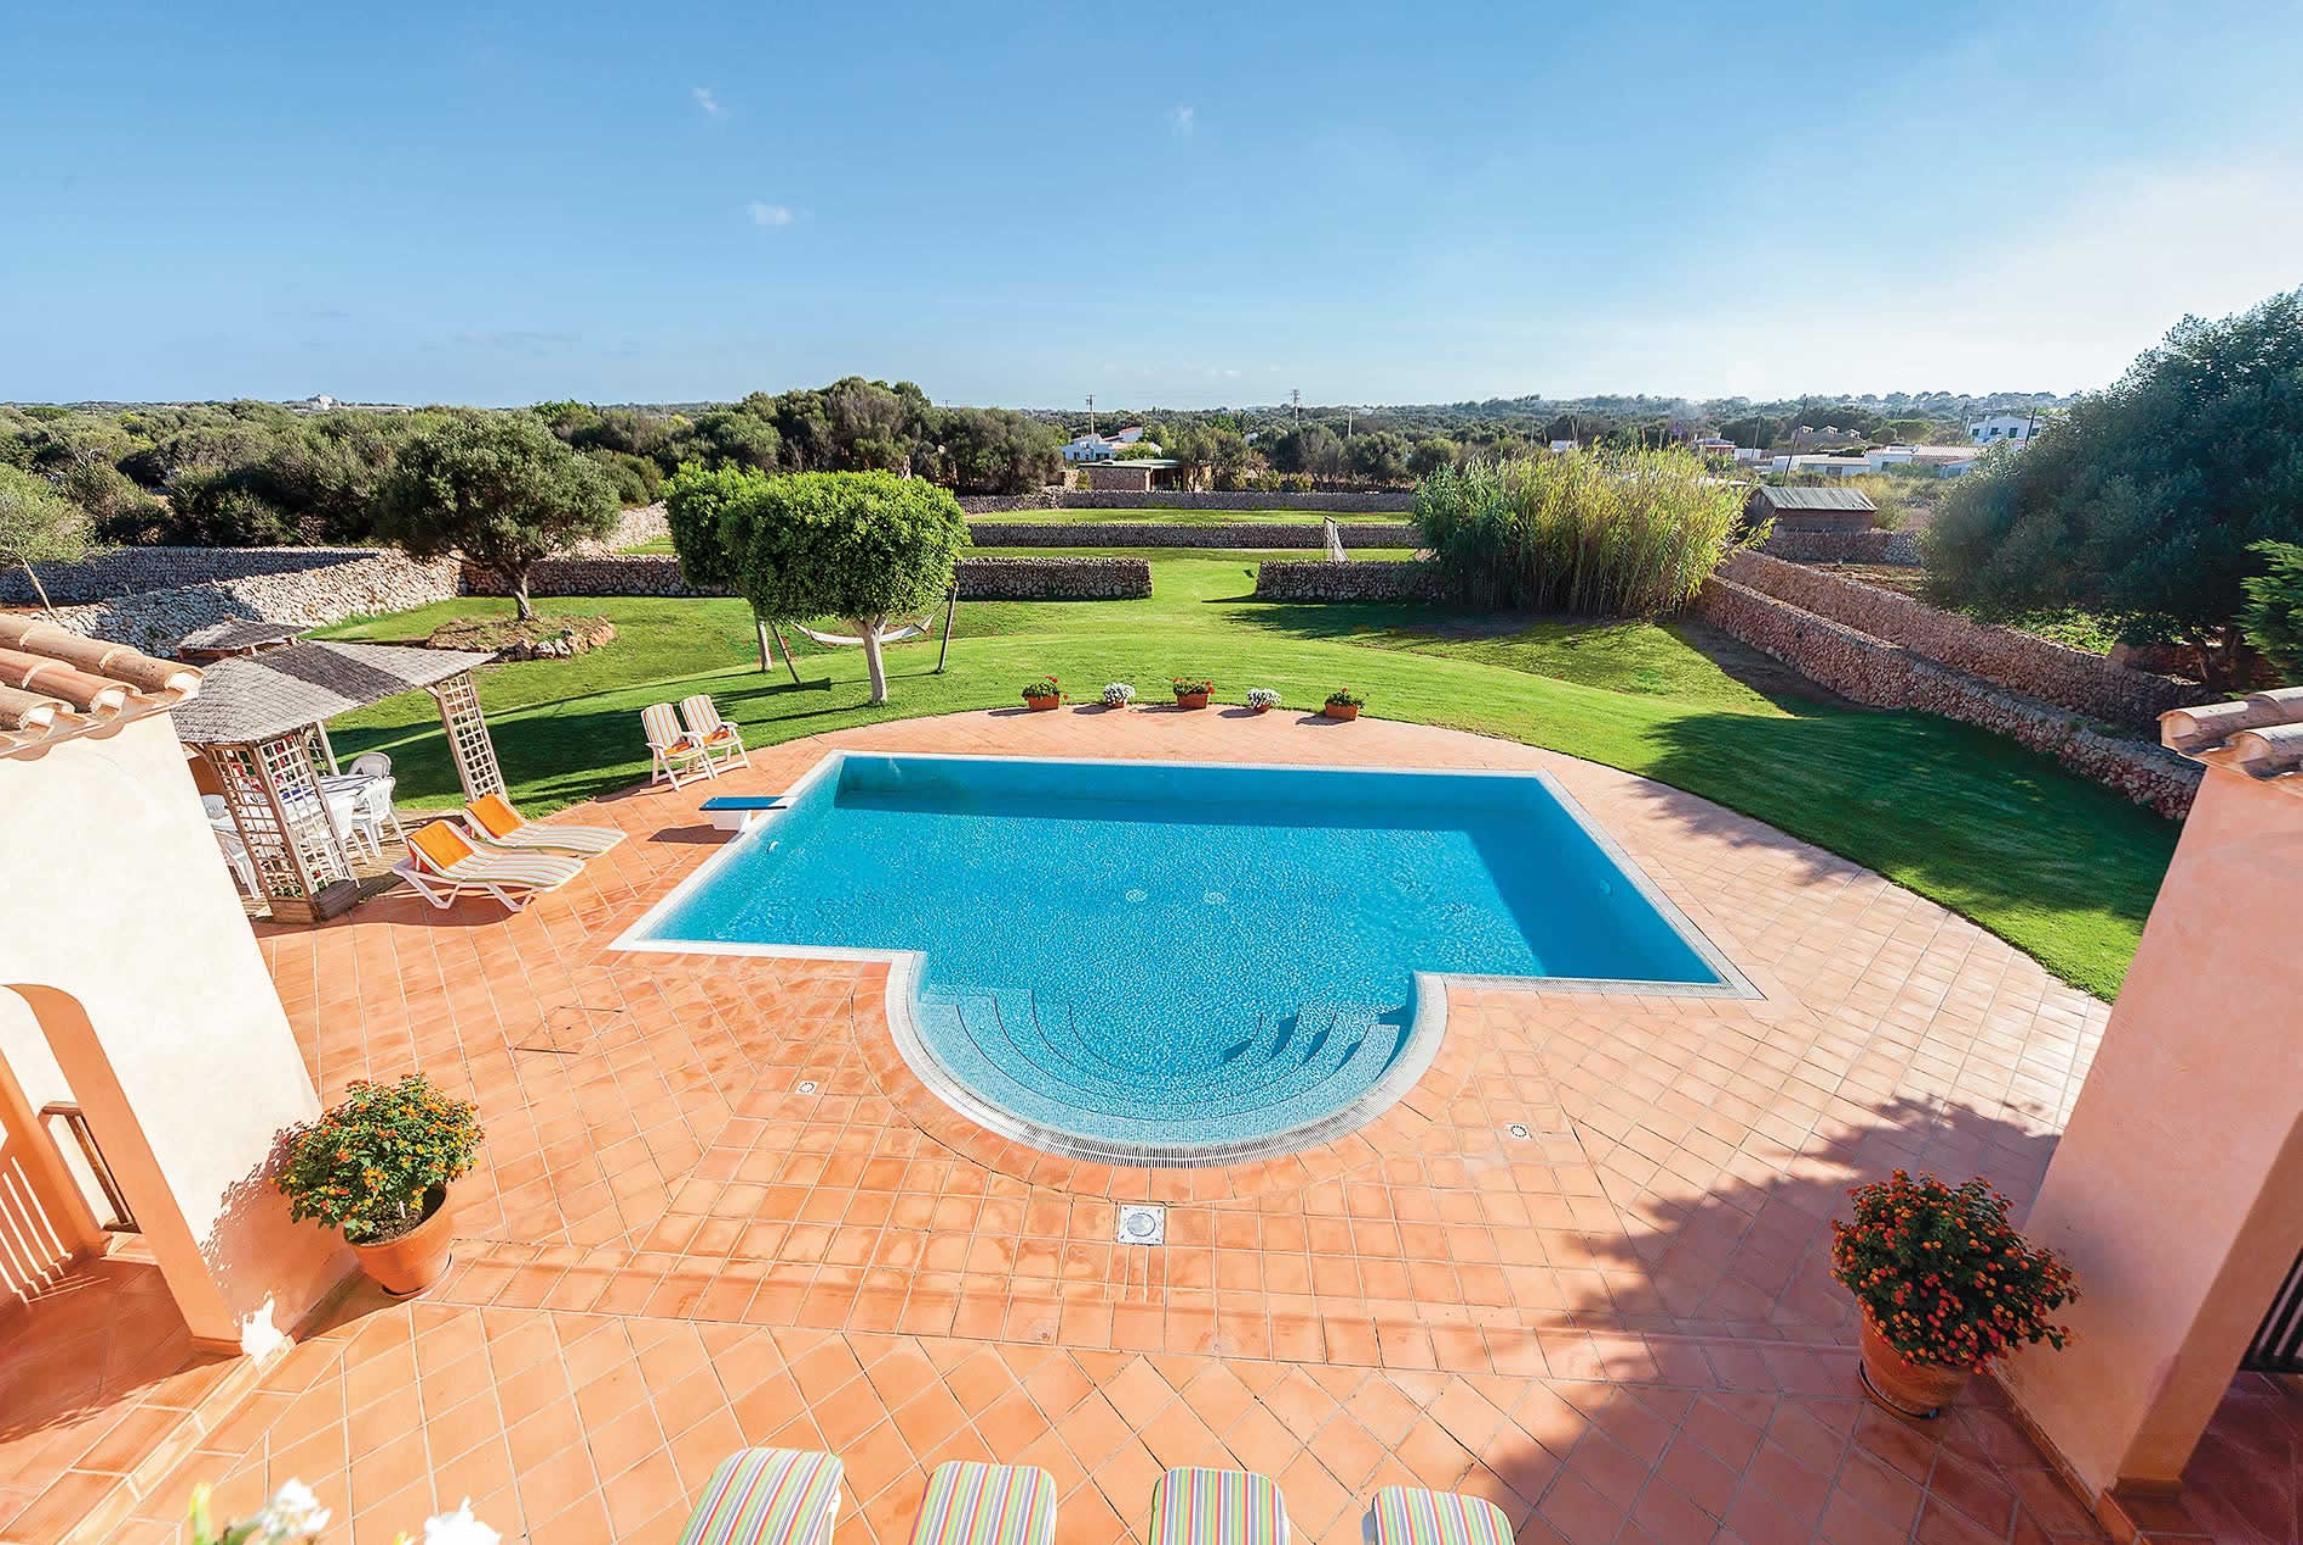 Ferienhaus Villa Estrellita (2649653), Punta Prima, Menorca, Balearische Inseln, Spanien, Bild 10